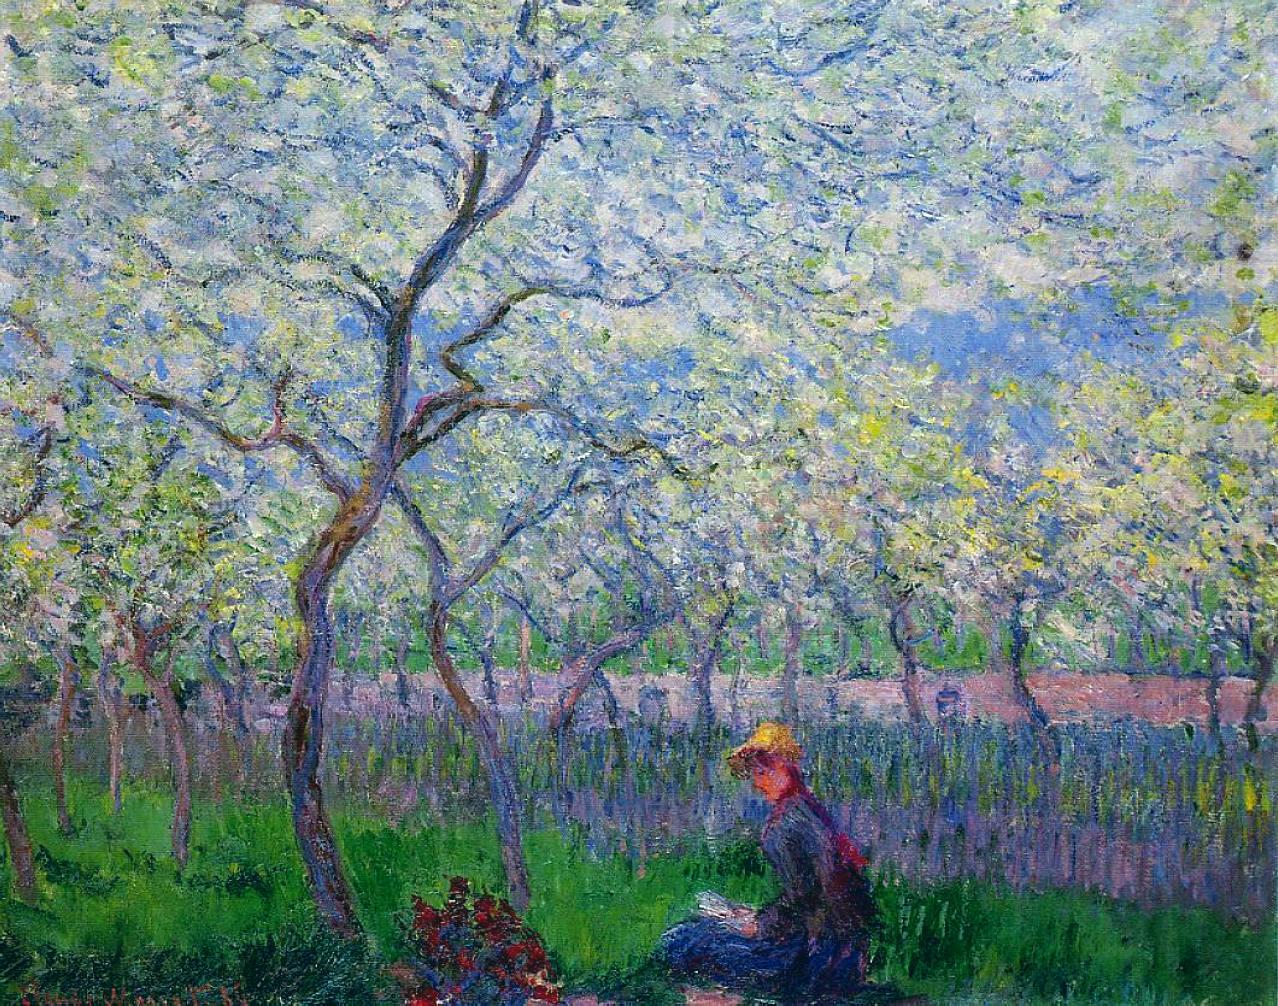 Обои Пейзаж, картина, Жуан-ле-Пен, Клод Моне. Разное foto 9